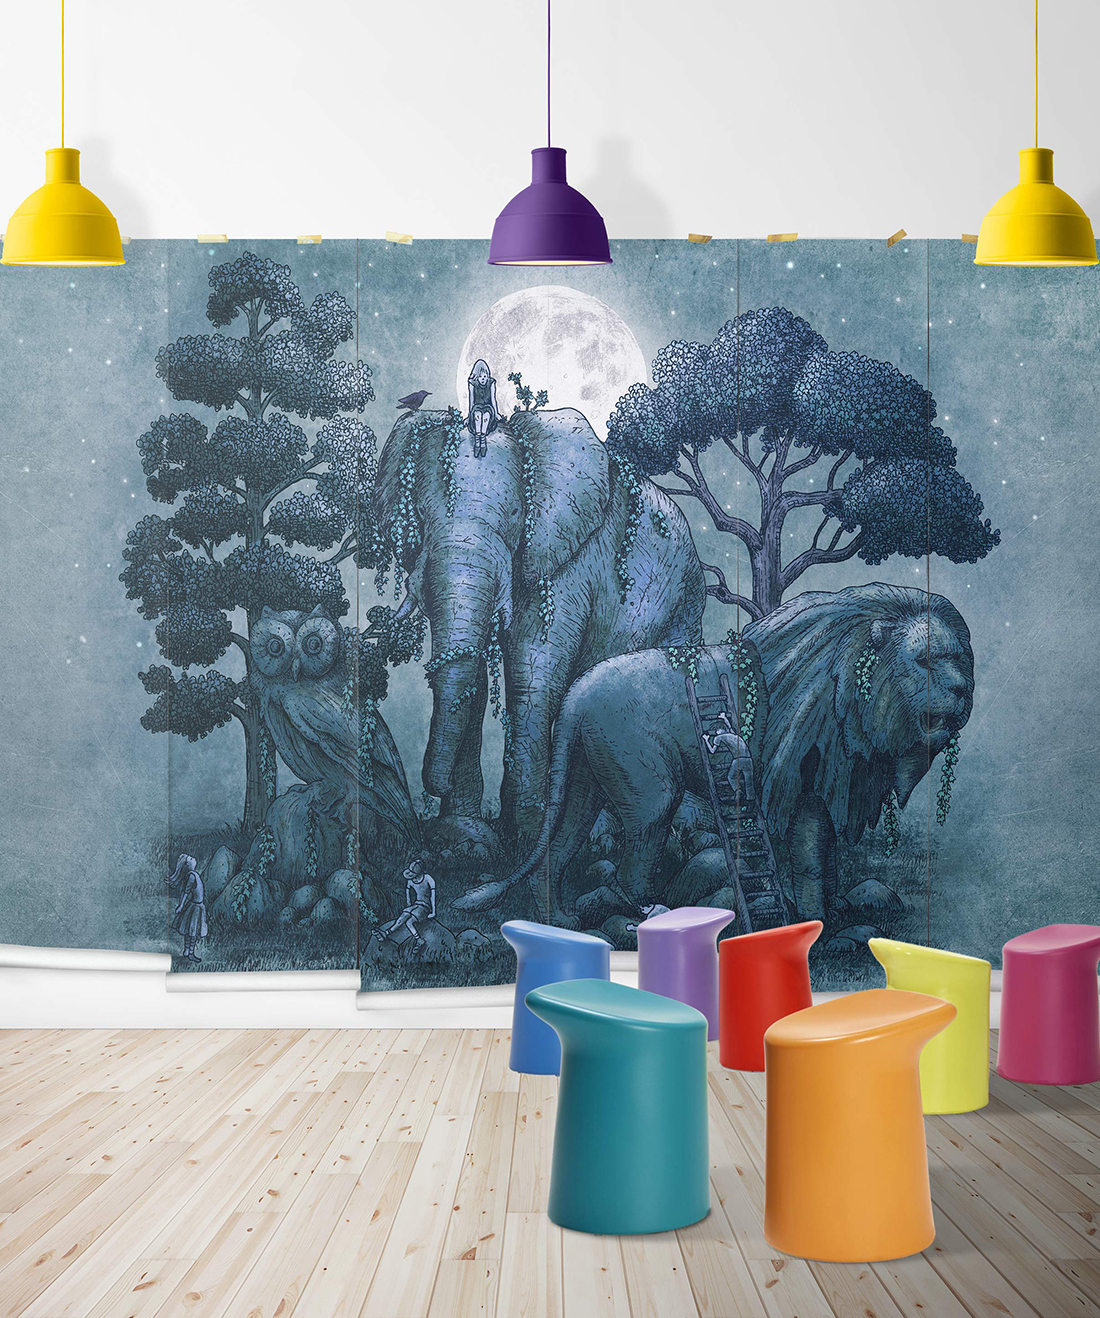 Midnight in the Stone Garden Mural